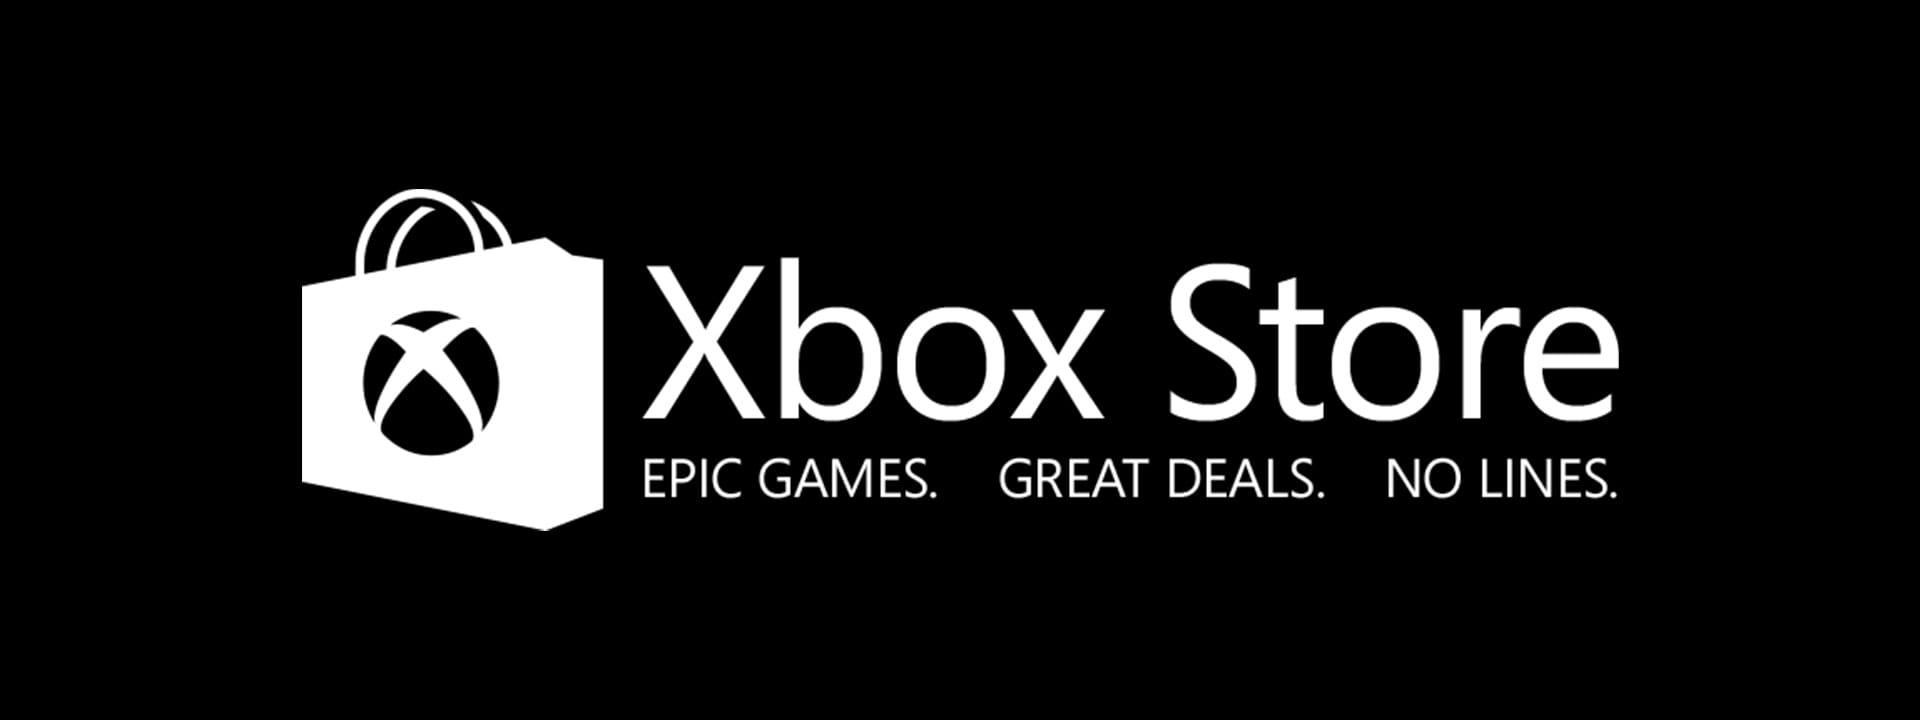 xbox store logo